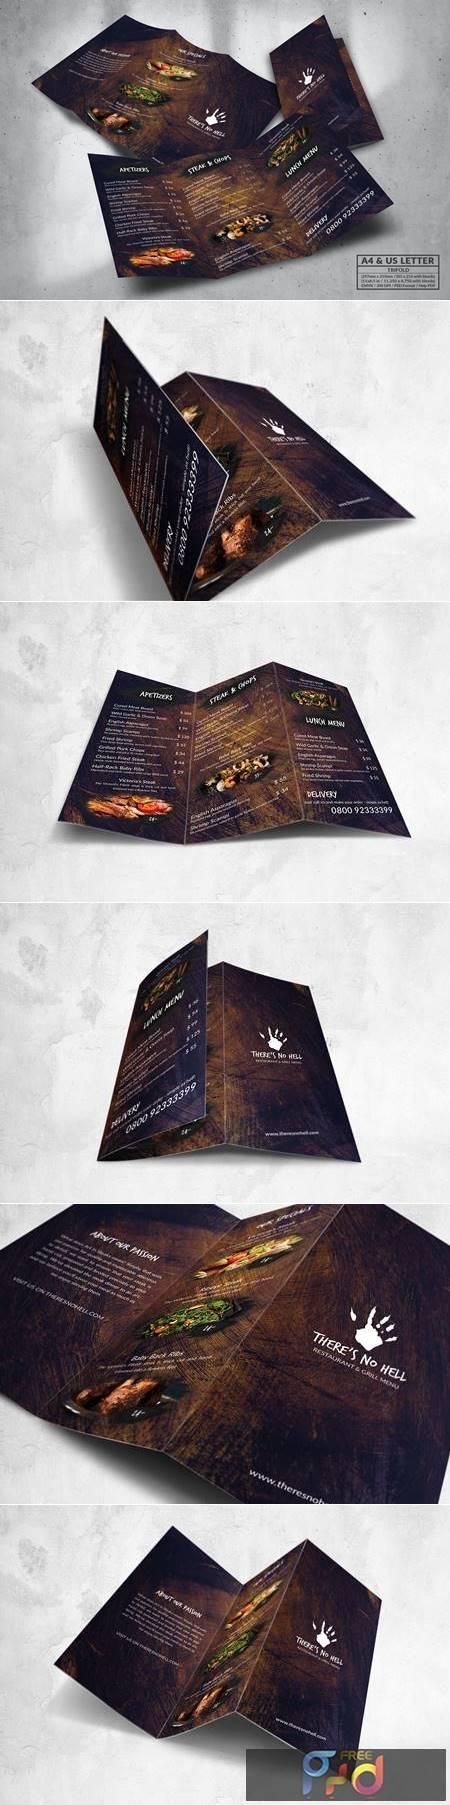 Trifold Food Menu Design A4 & US Letter FMFWN2N 1